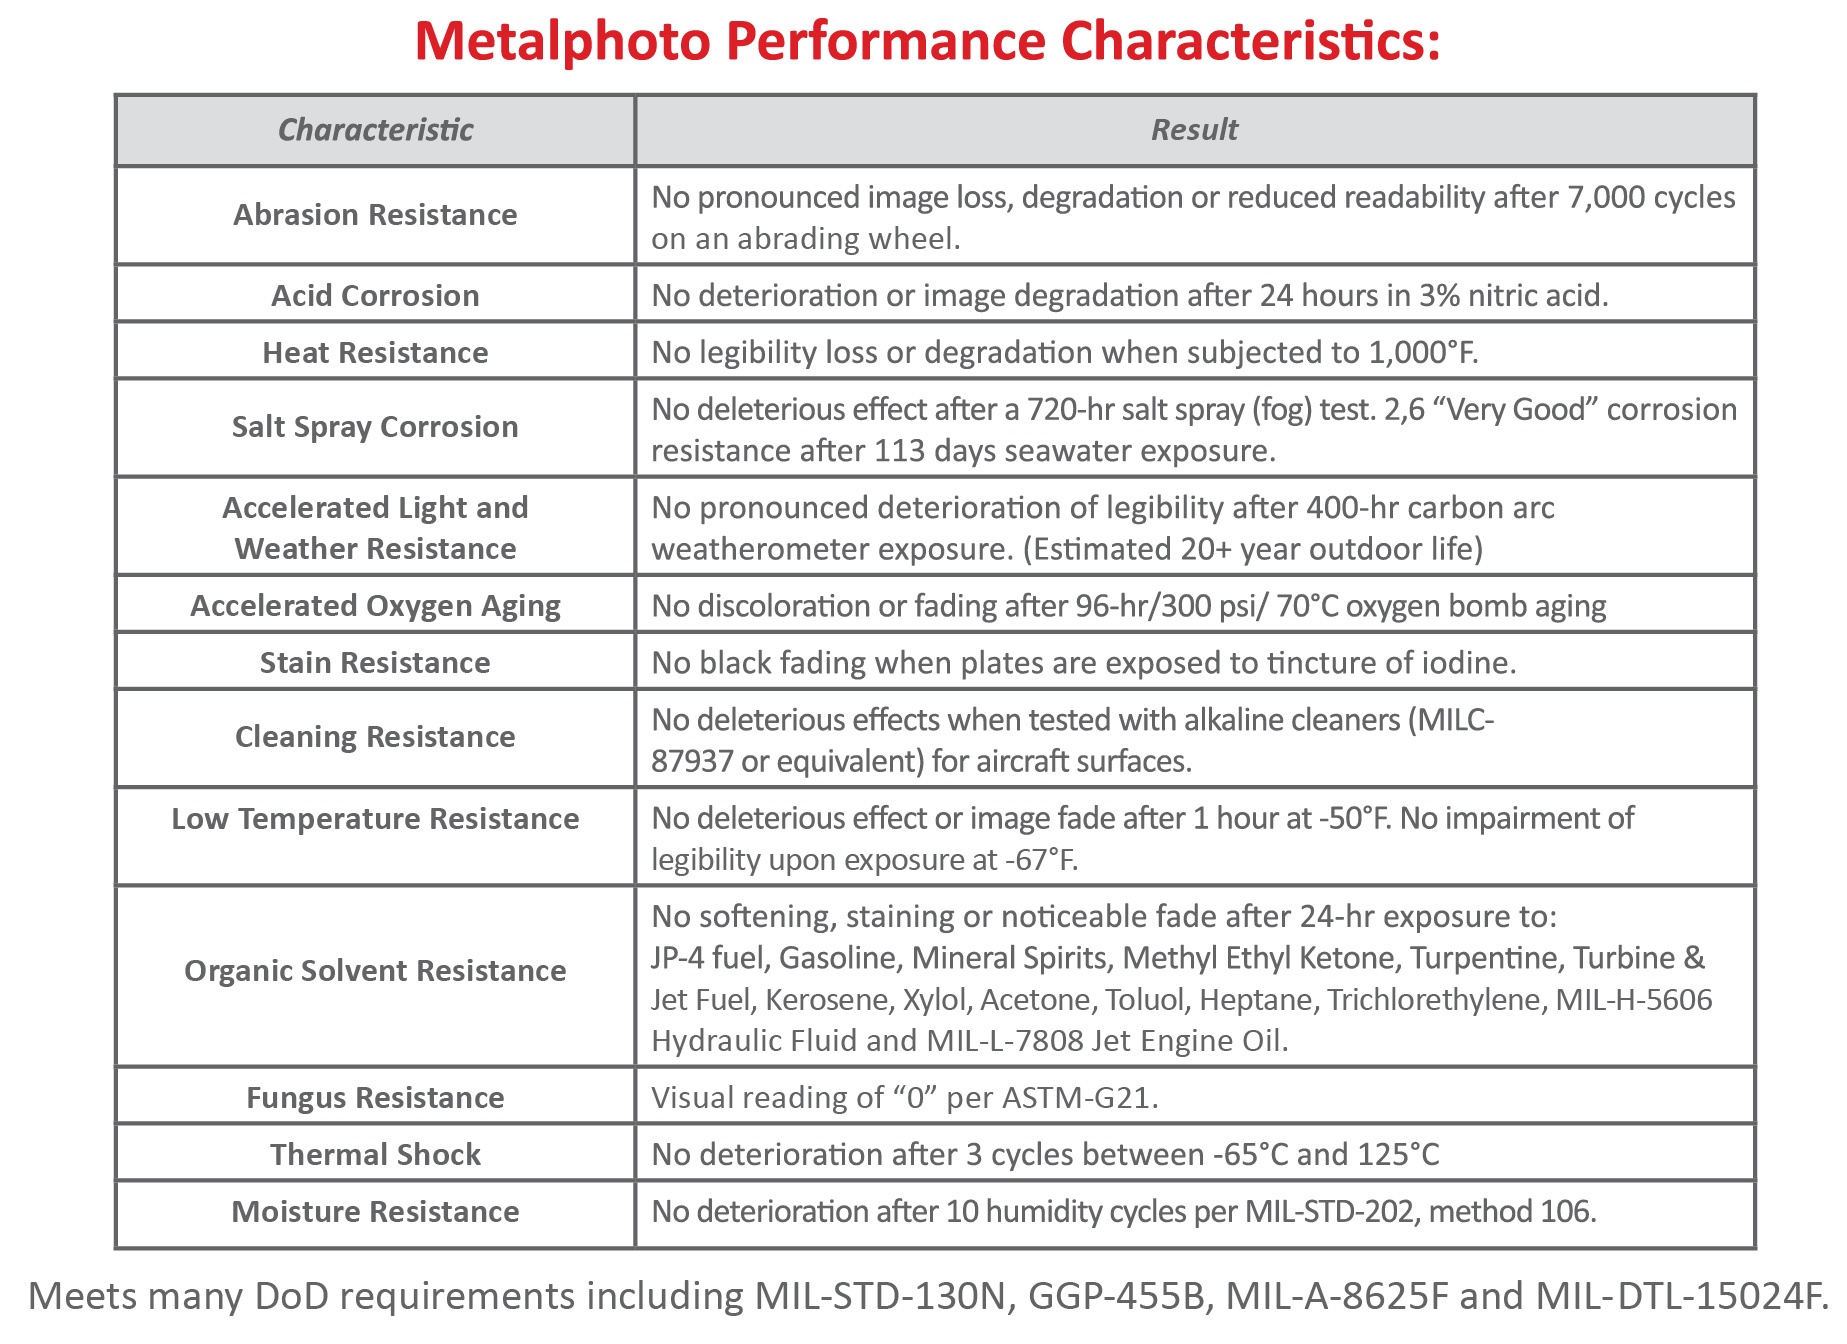 metalphoto_performance_characterisitcs.jpg